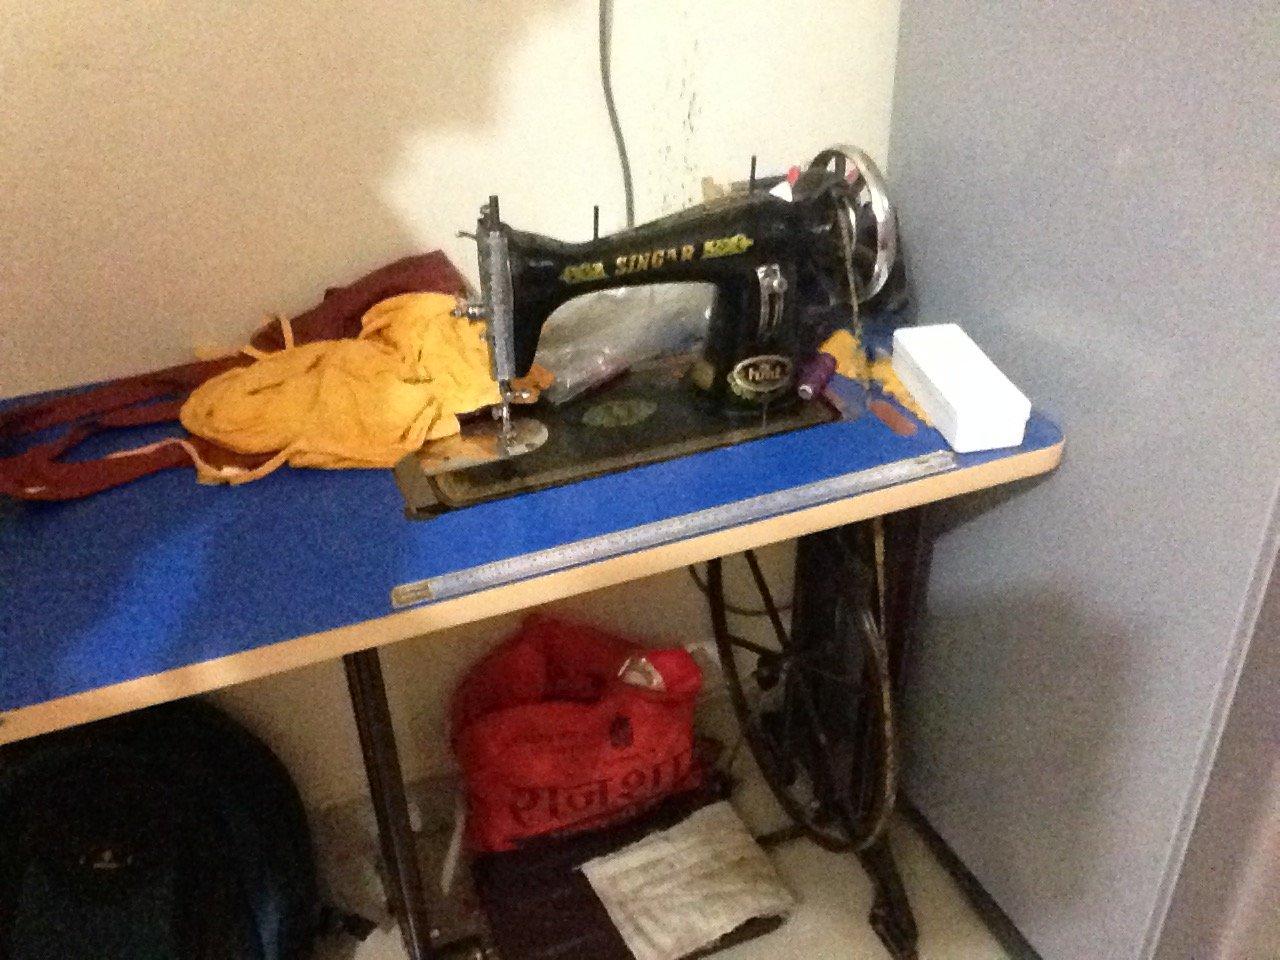 Top 40 Industrial Sewing Machine Repair Services In Janta Colony Adorable Industrial Sewing Machine Repair